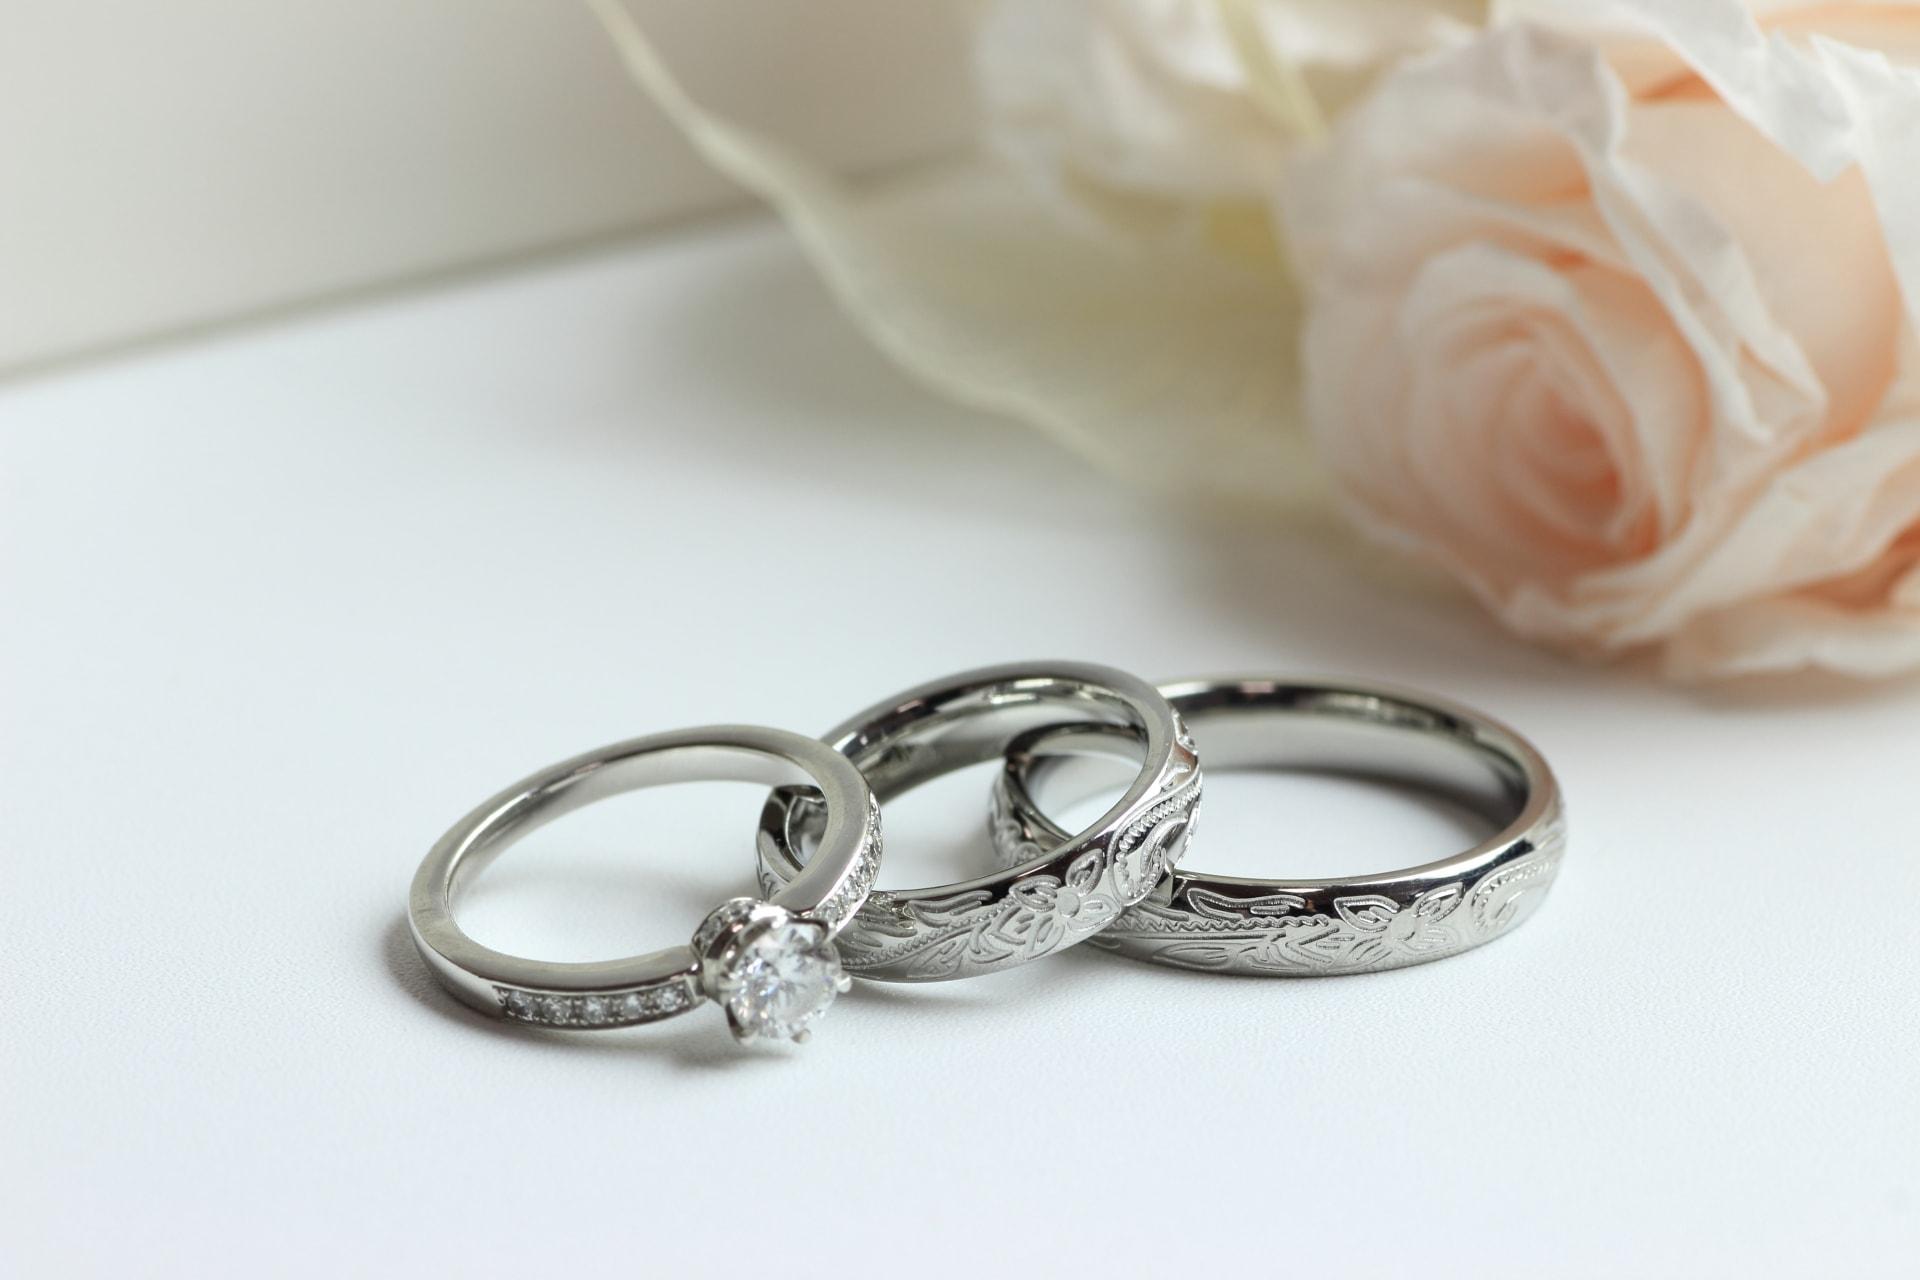 【結婚】婚約指輪の準備